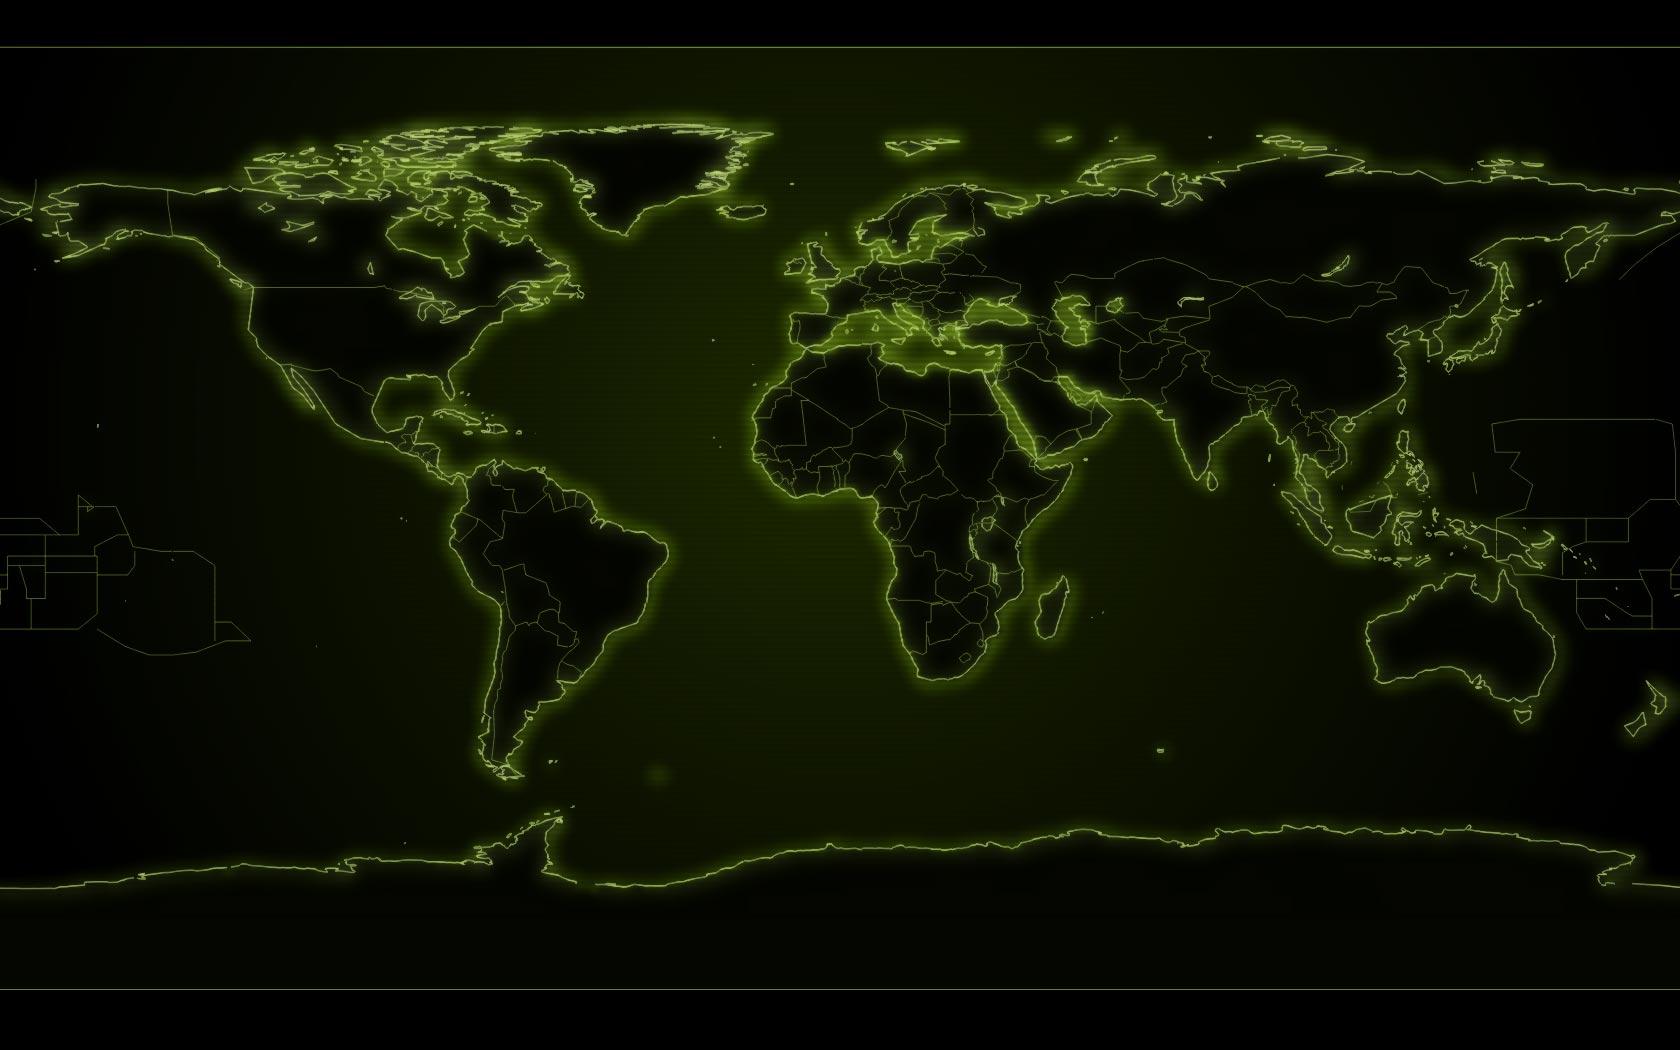 Desktop wallpaper world map wallpapersafari map computer wallpapers desktop backgrounds 1680x1050 id75868 1680x1050 gumiabroncs Gallery